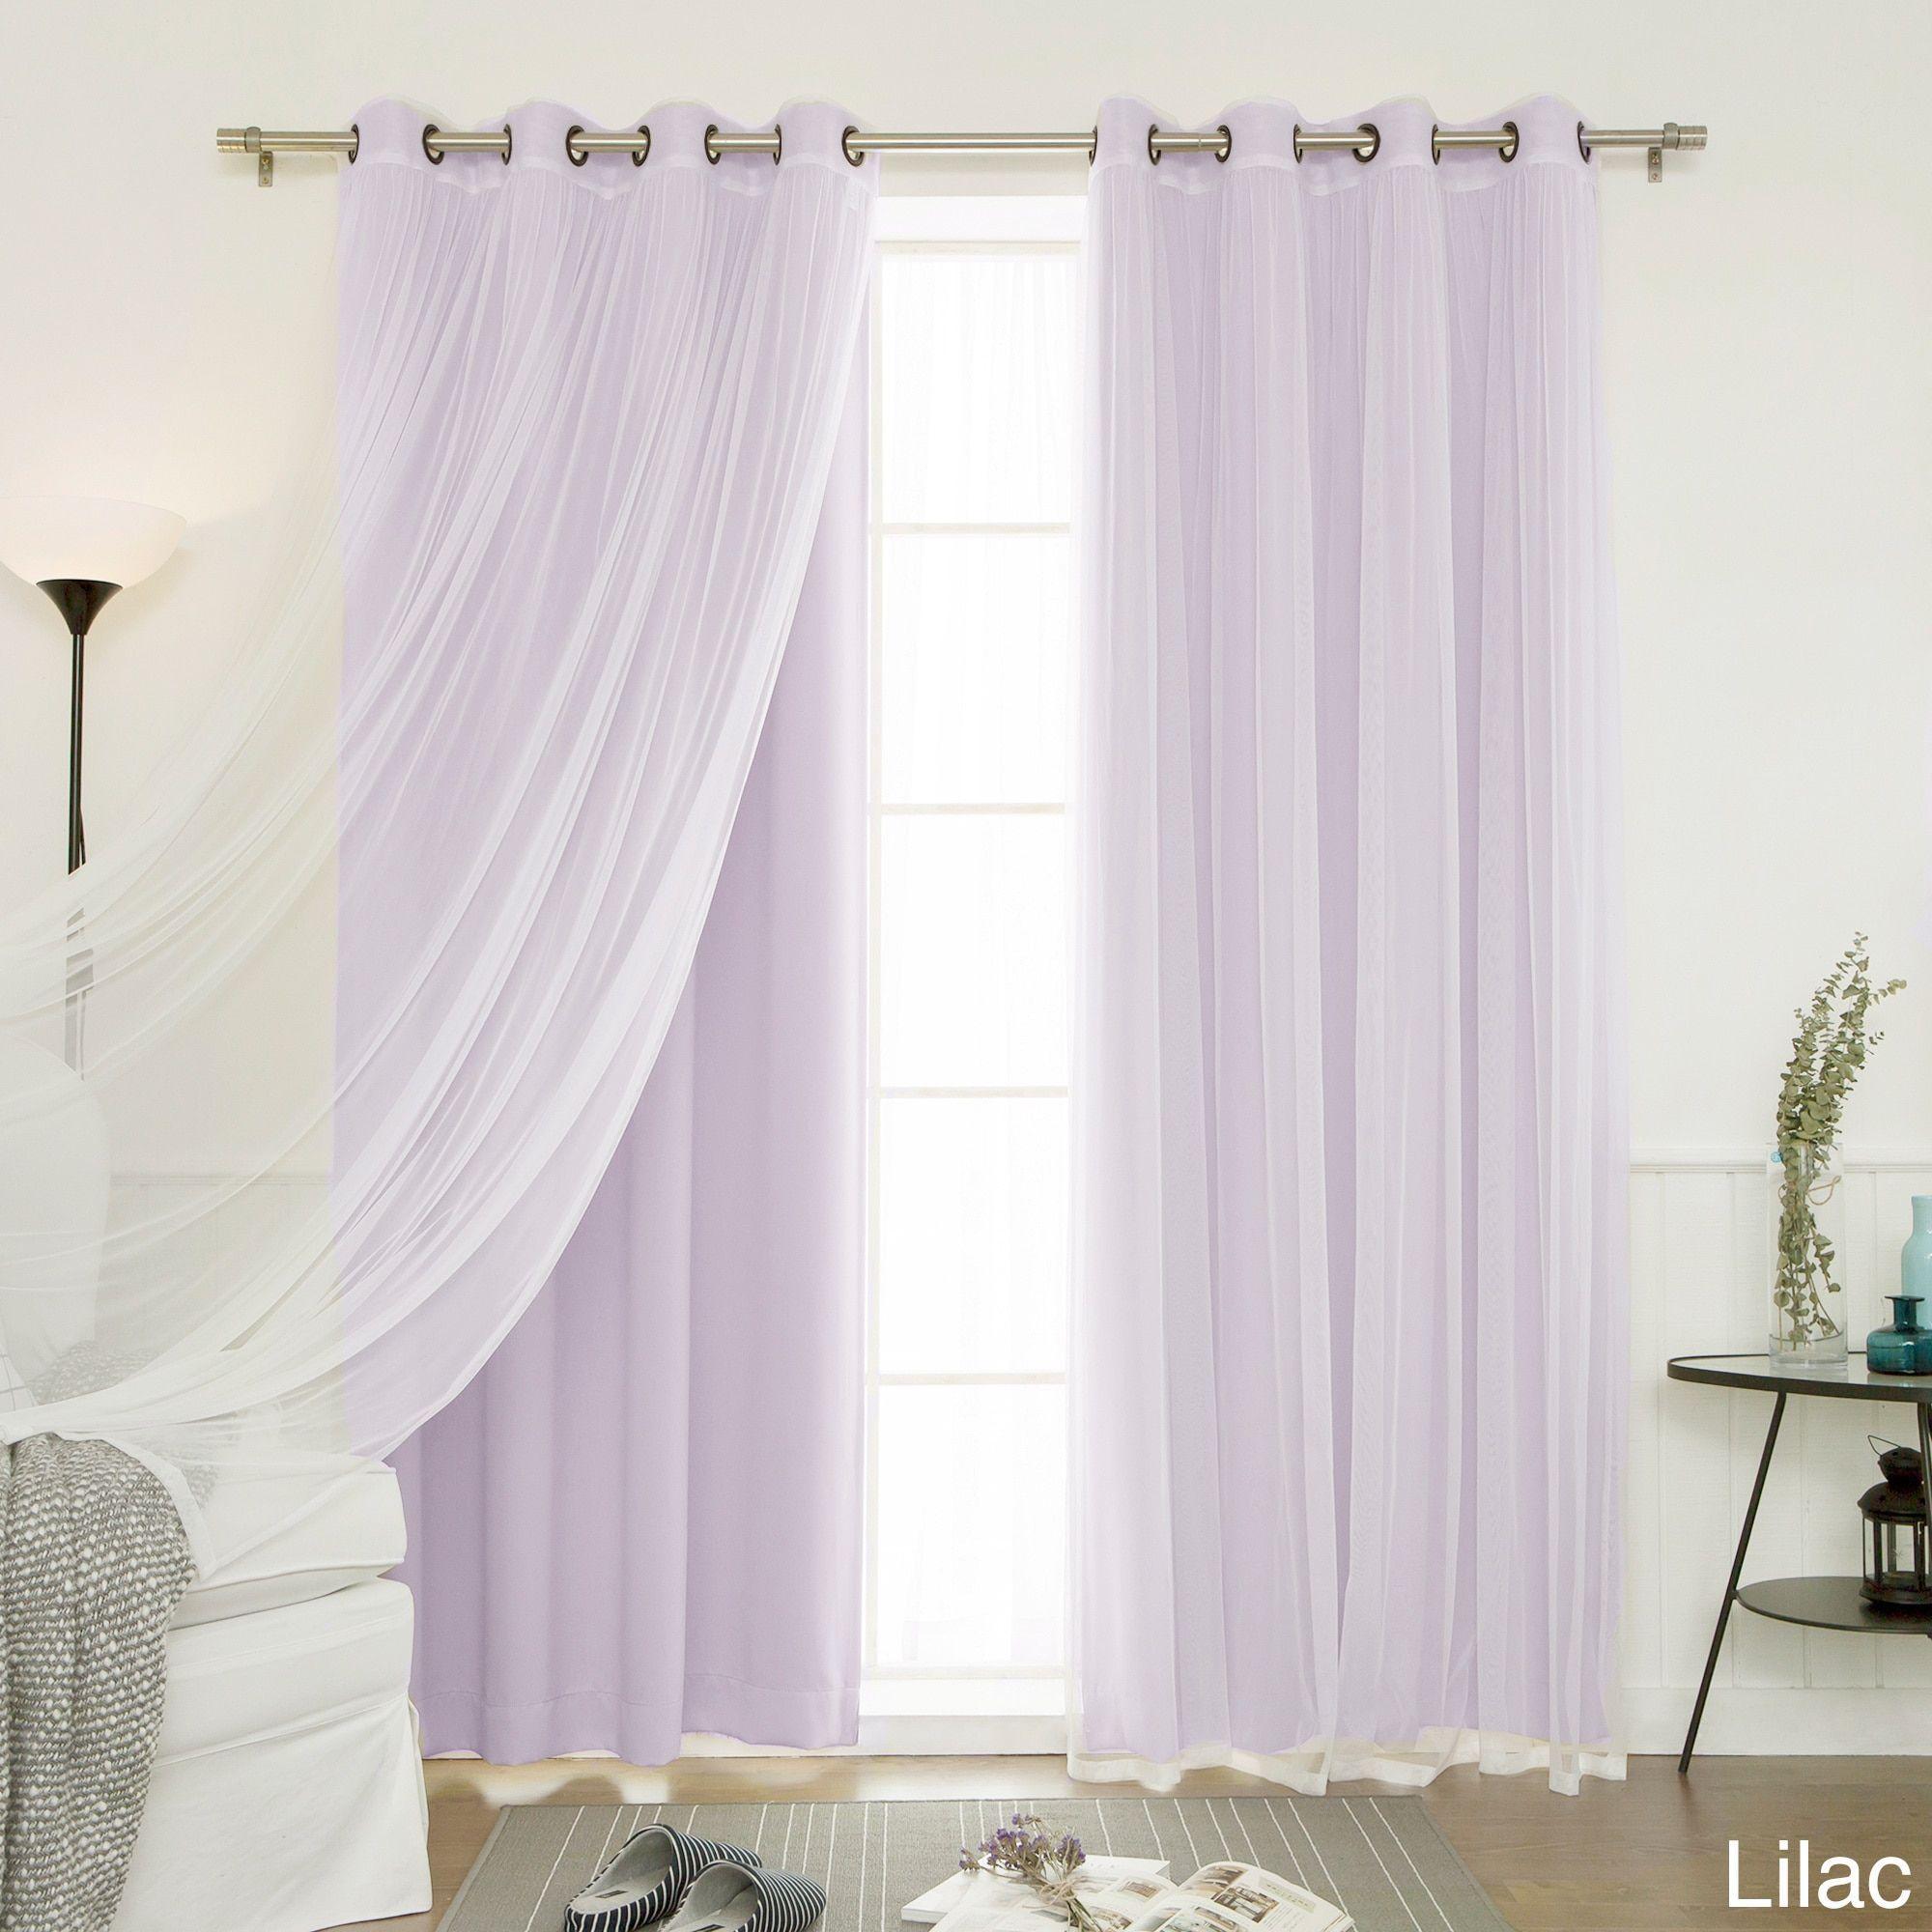 Elegant Aurora Home MIX U0026 Match Curtains Blackout Tulle Lace Sheer Bronze Grommet  4 Piece Curtain